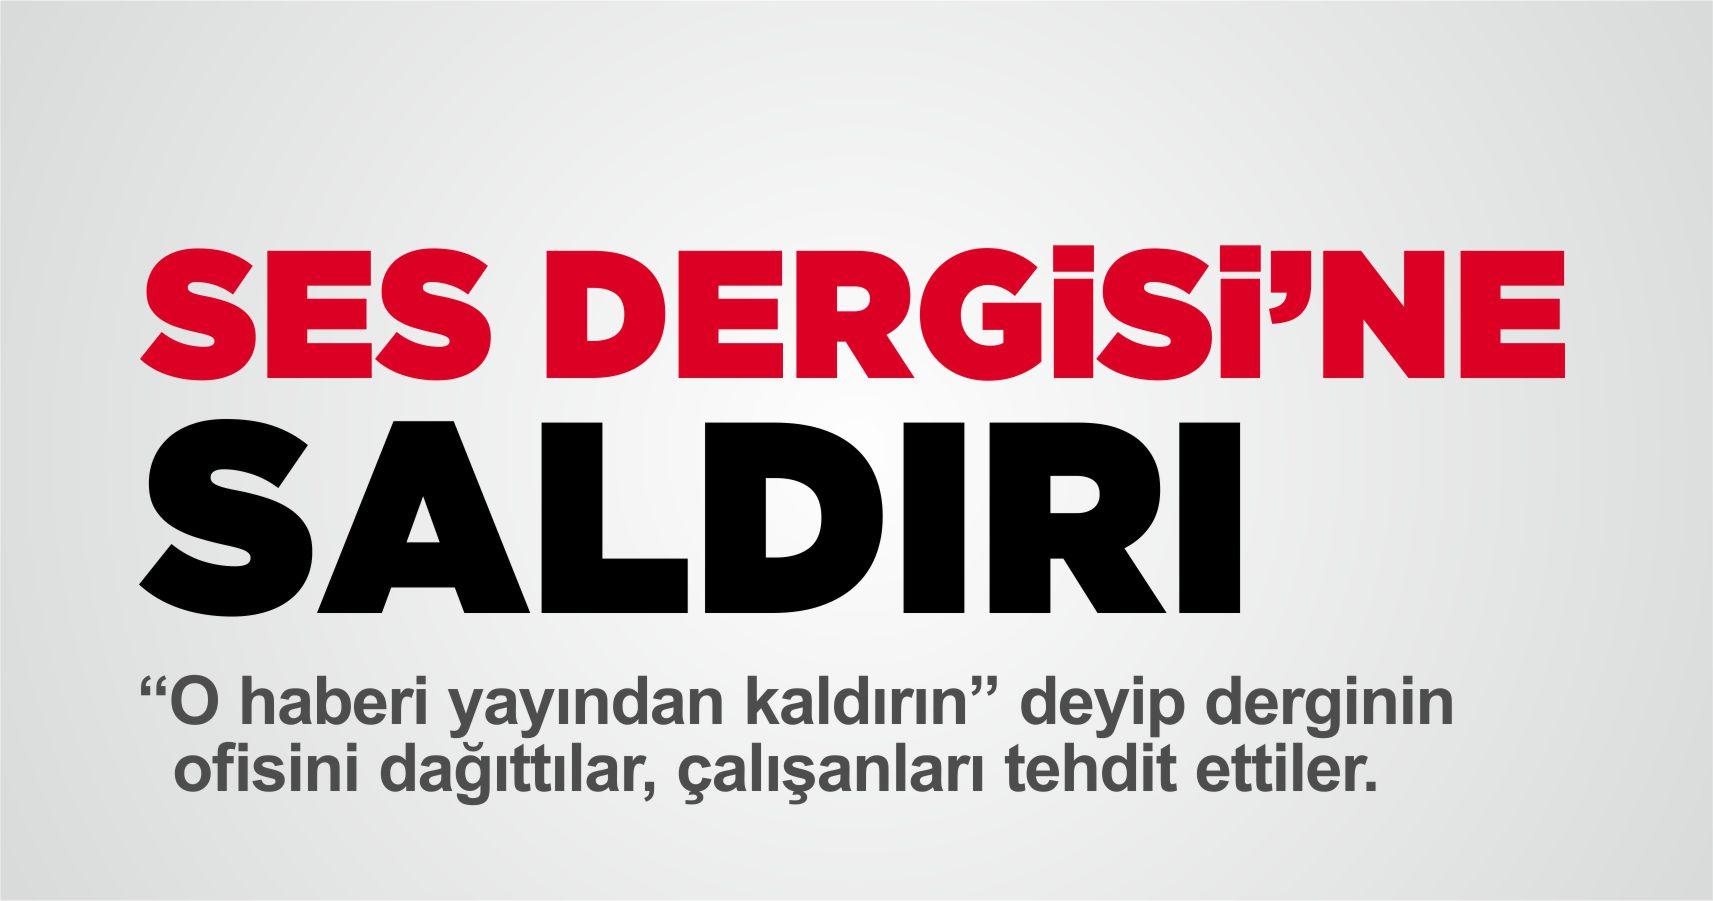 SES DERGİSİ'NE SALDIRI